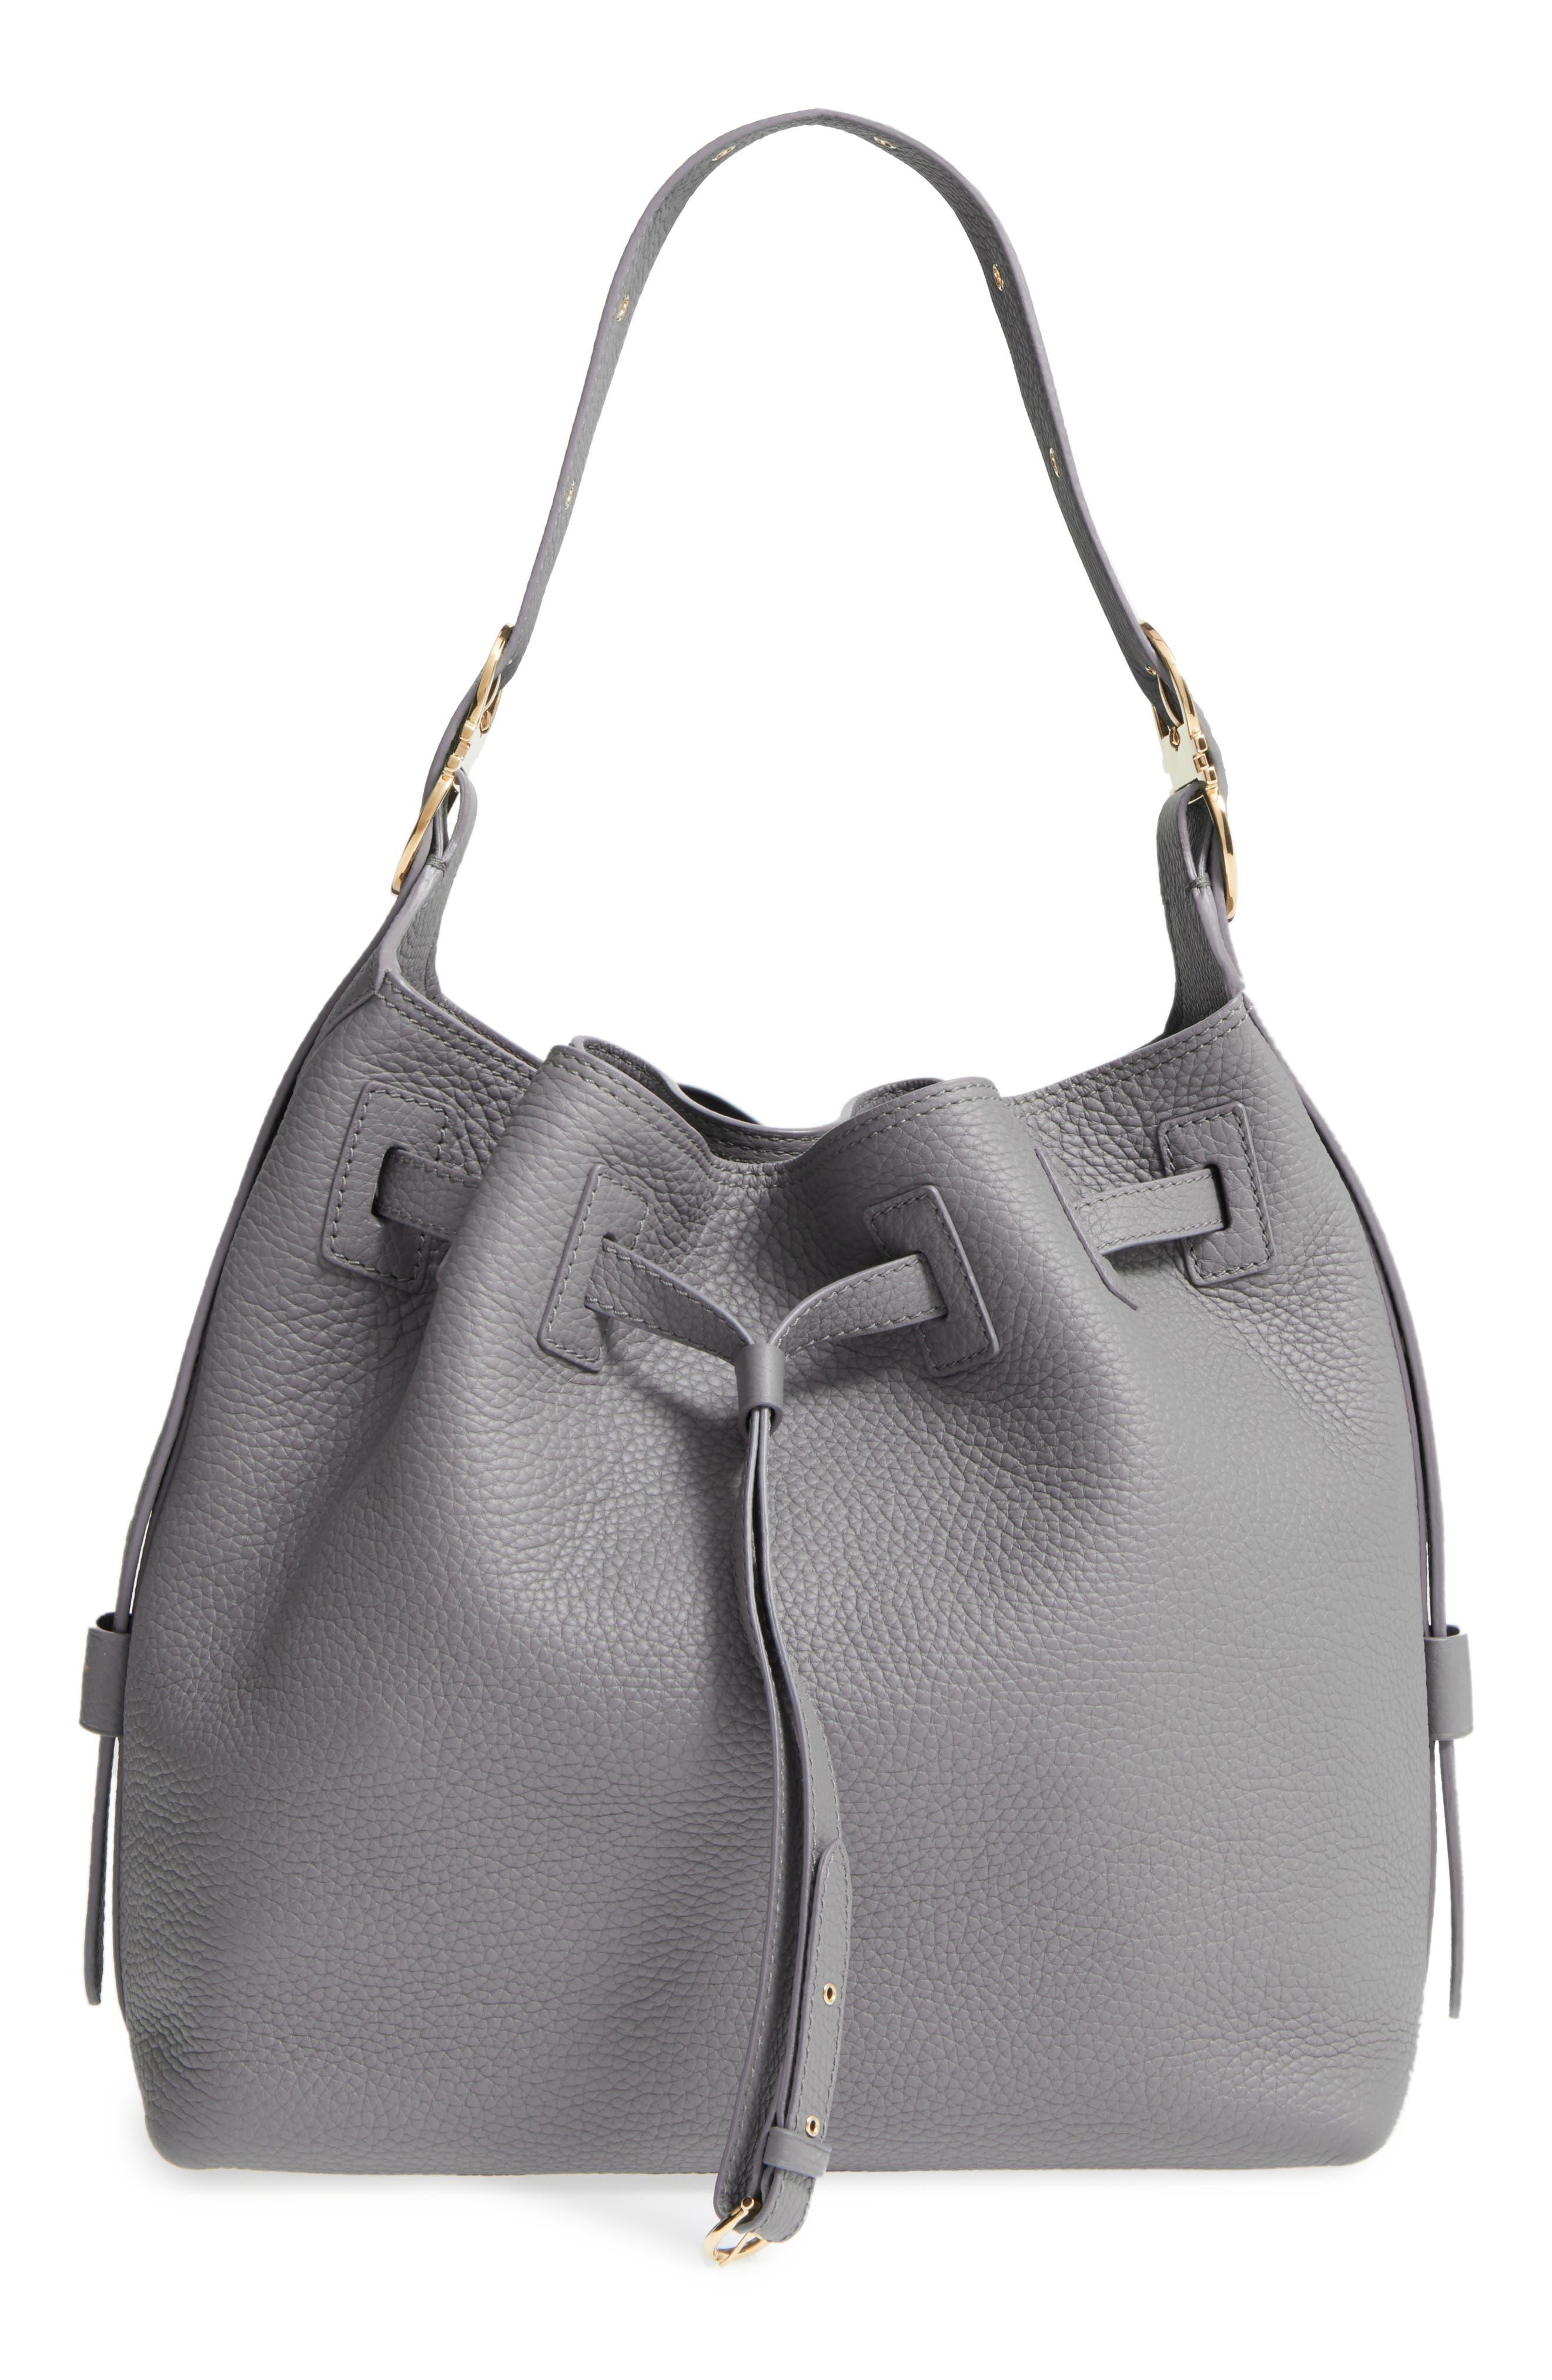 Salvatore Ferragamo Pebbled Leather Drawstring Bucket Bag